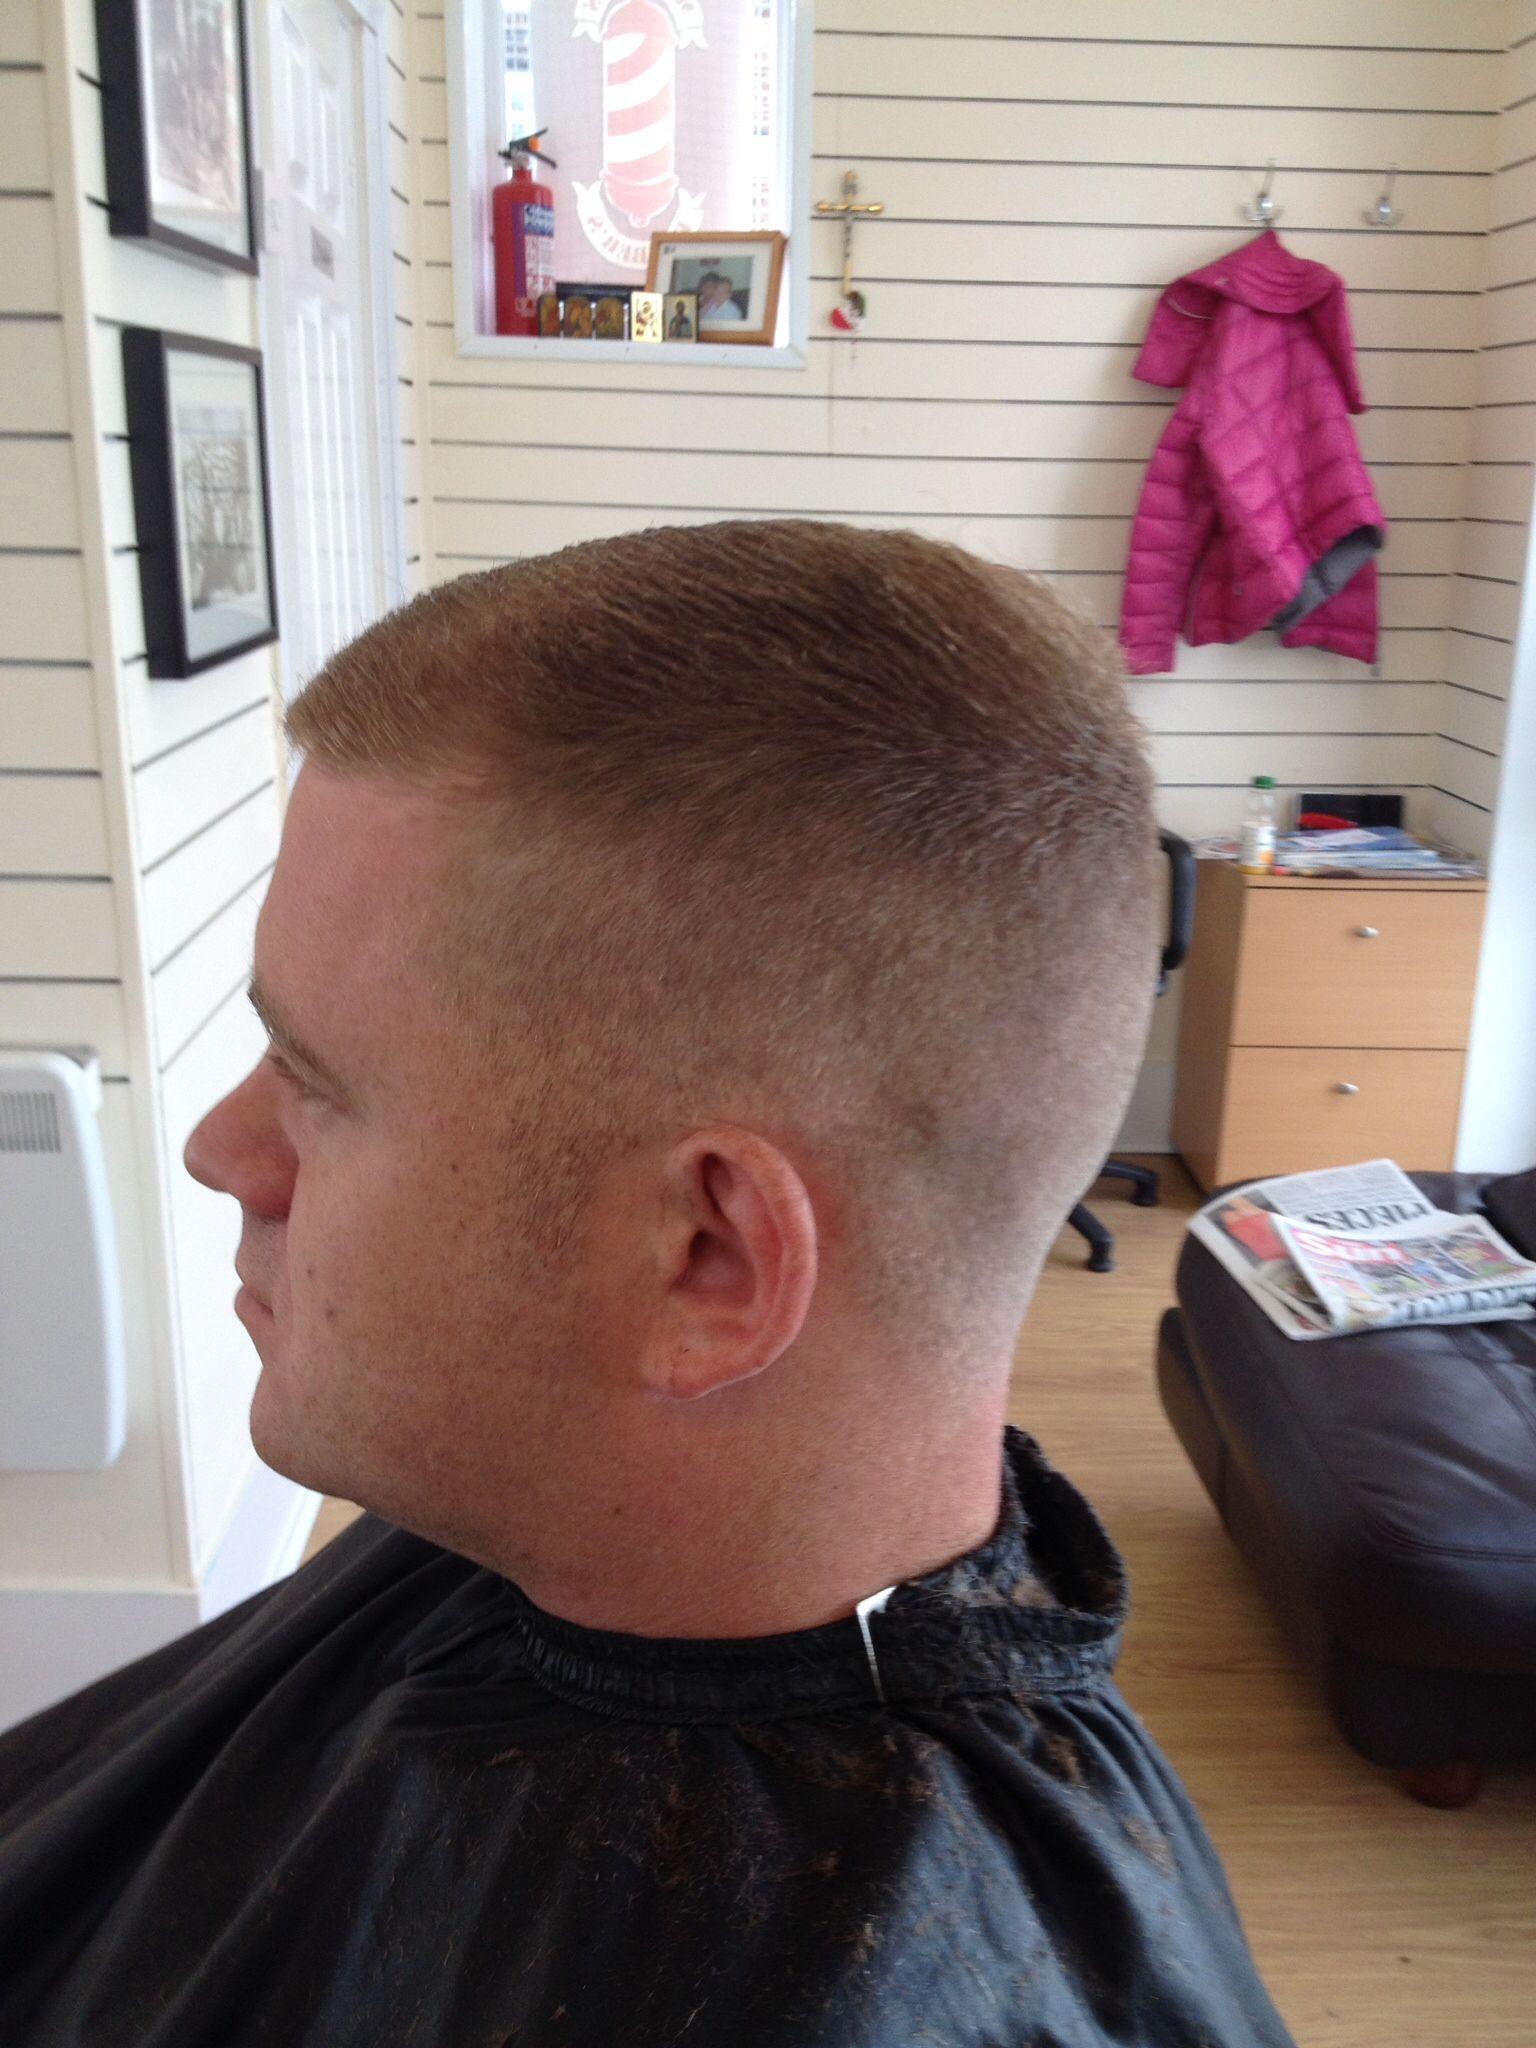 Buzz cut haircut men my first cut at  this morning  my hair cuts  pinterest  this